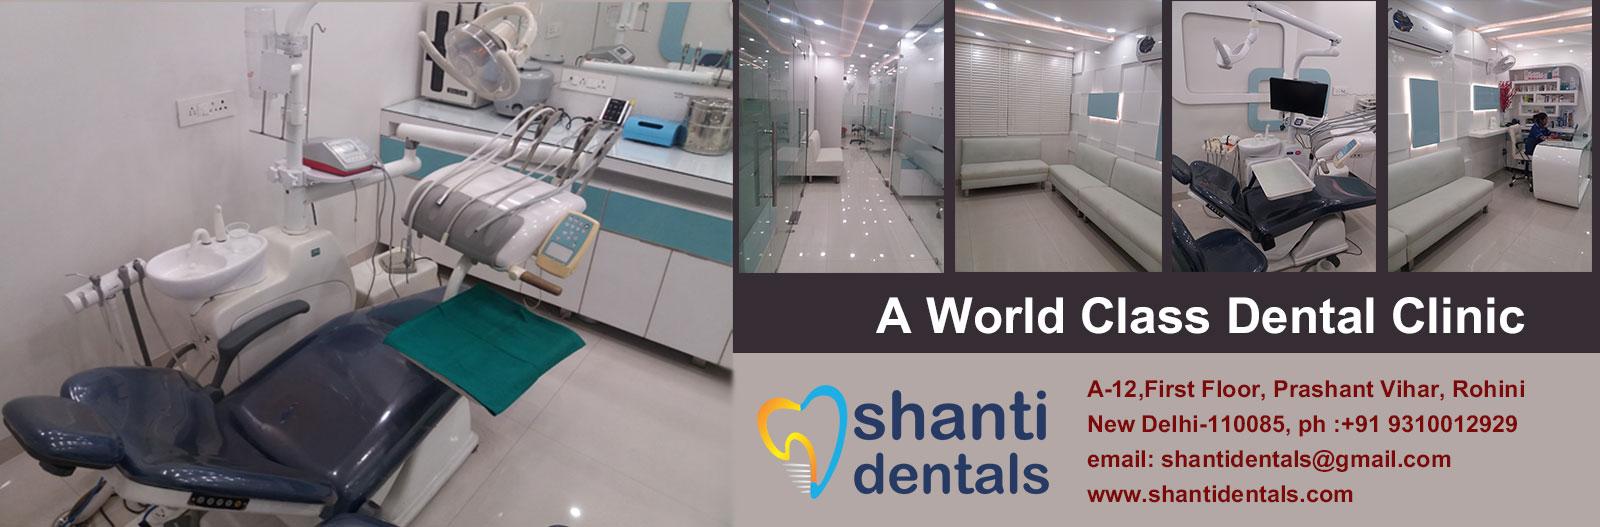 Shanti Dentals Banner-5